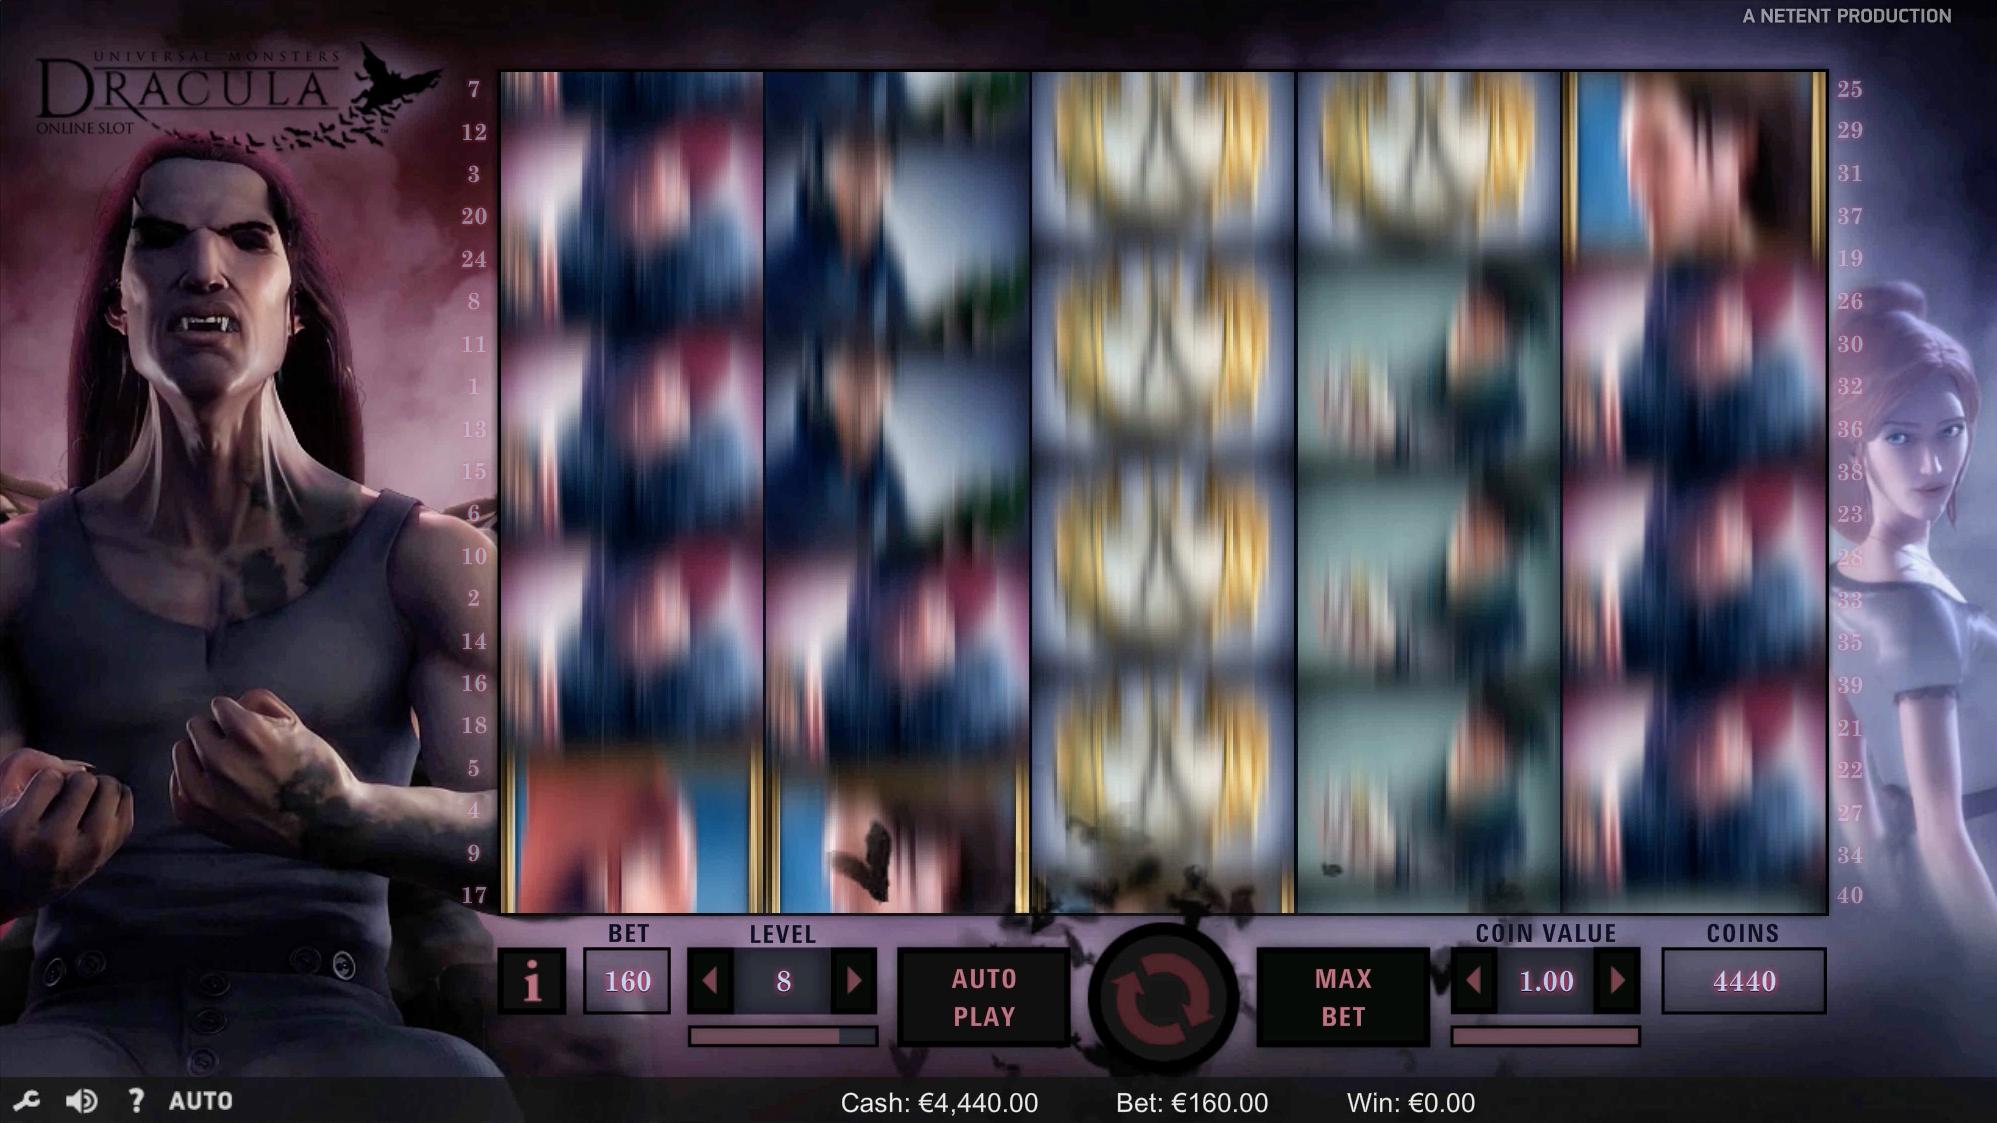 Dracula-video-slot